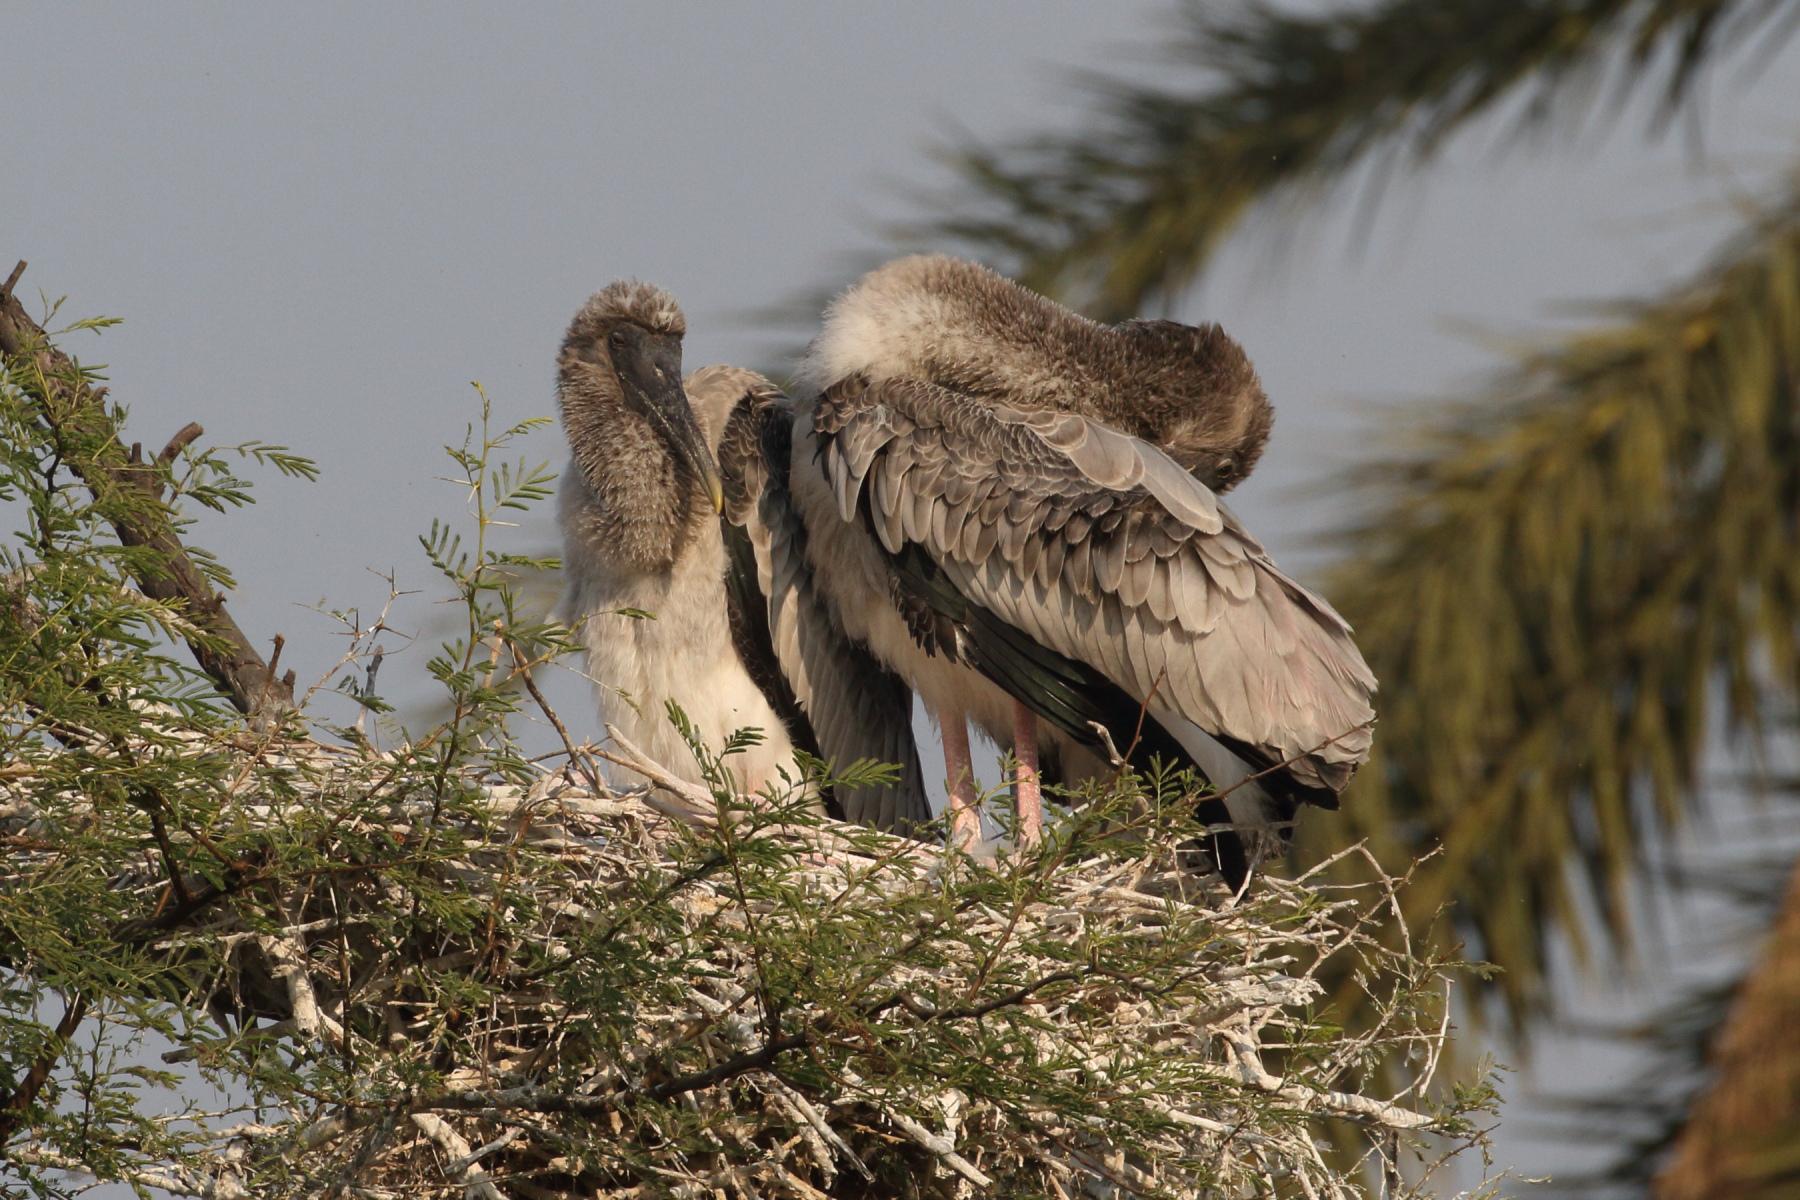 Nestlings of Painted Stork